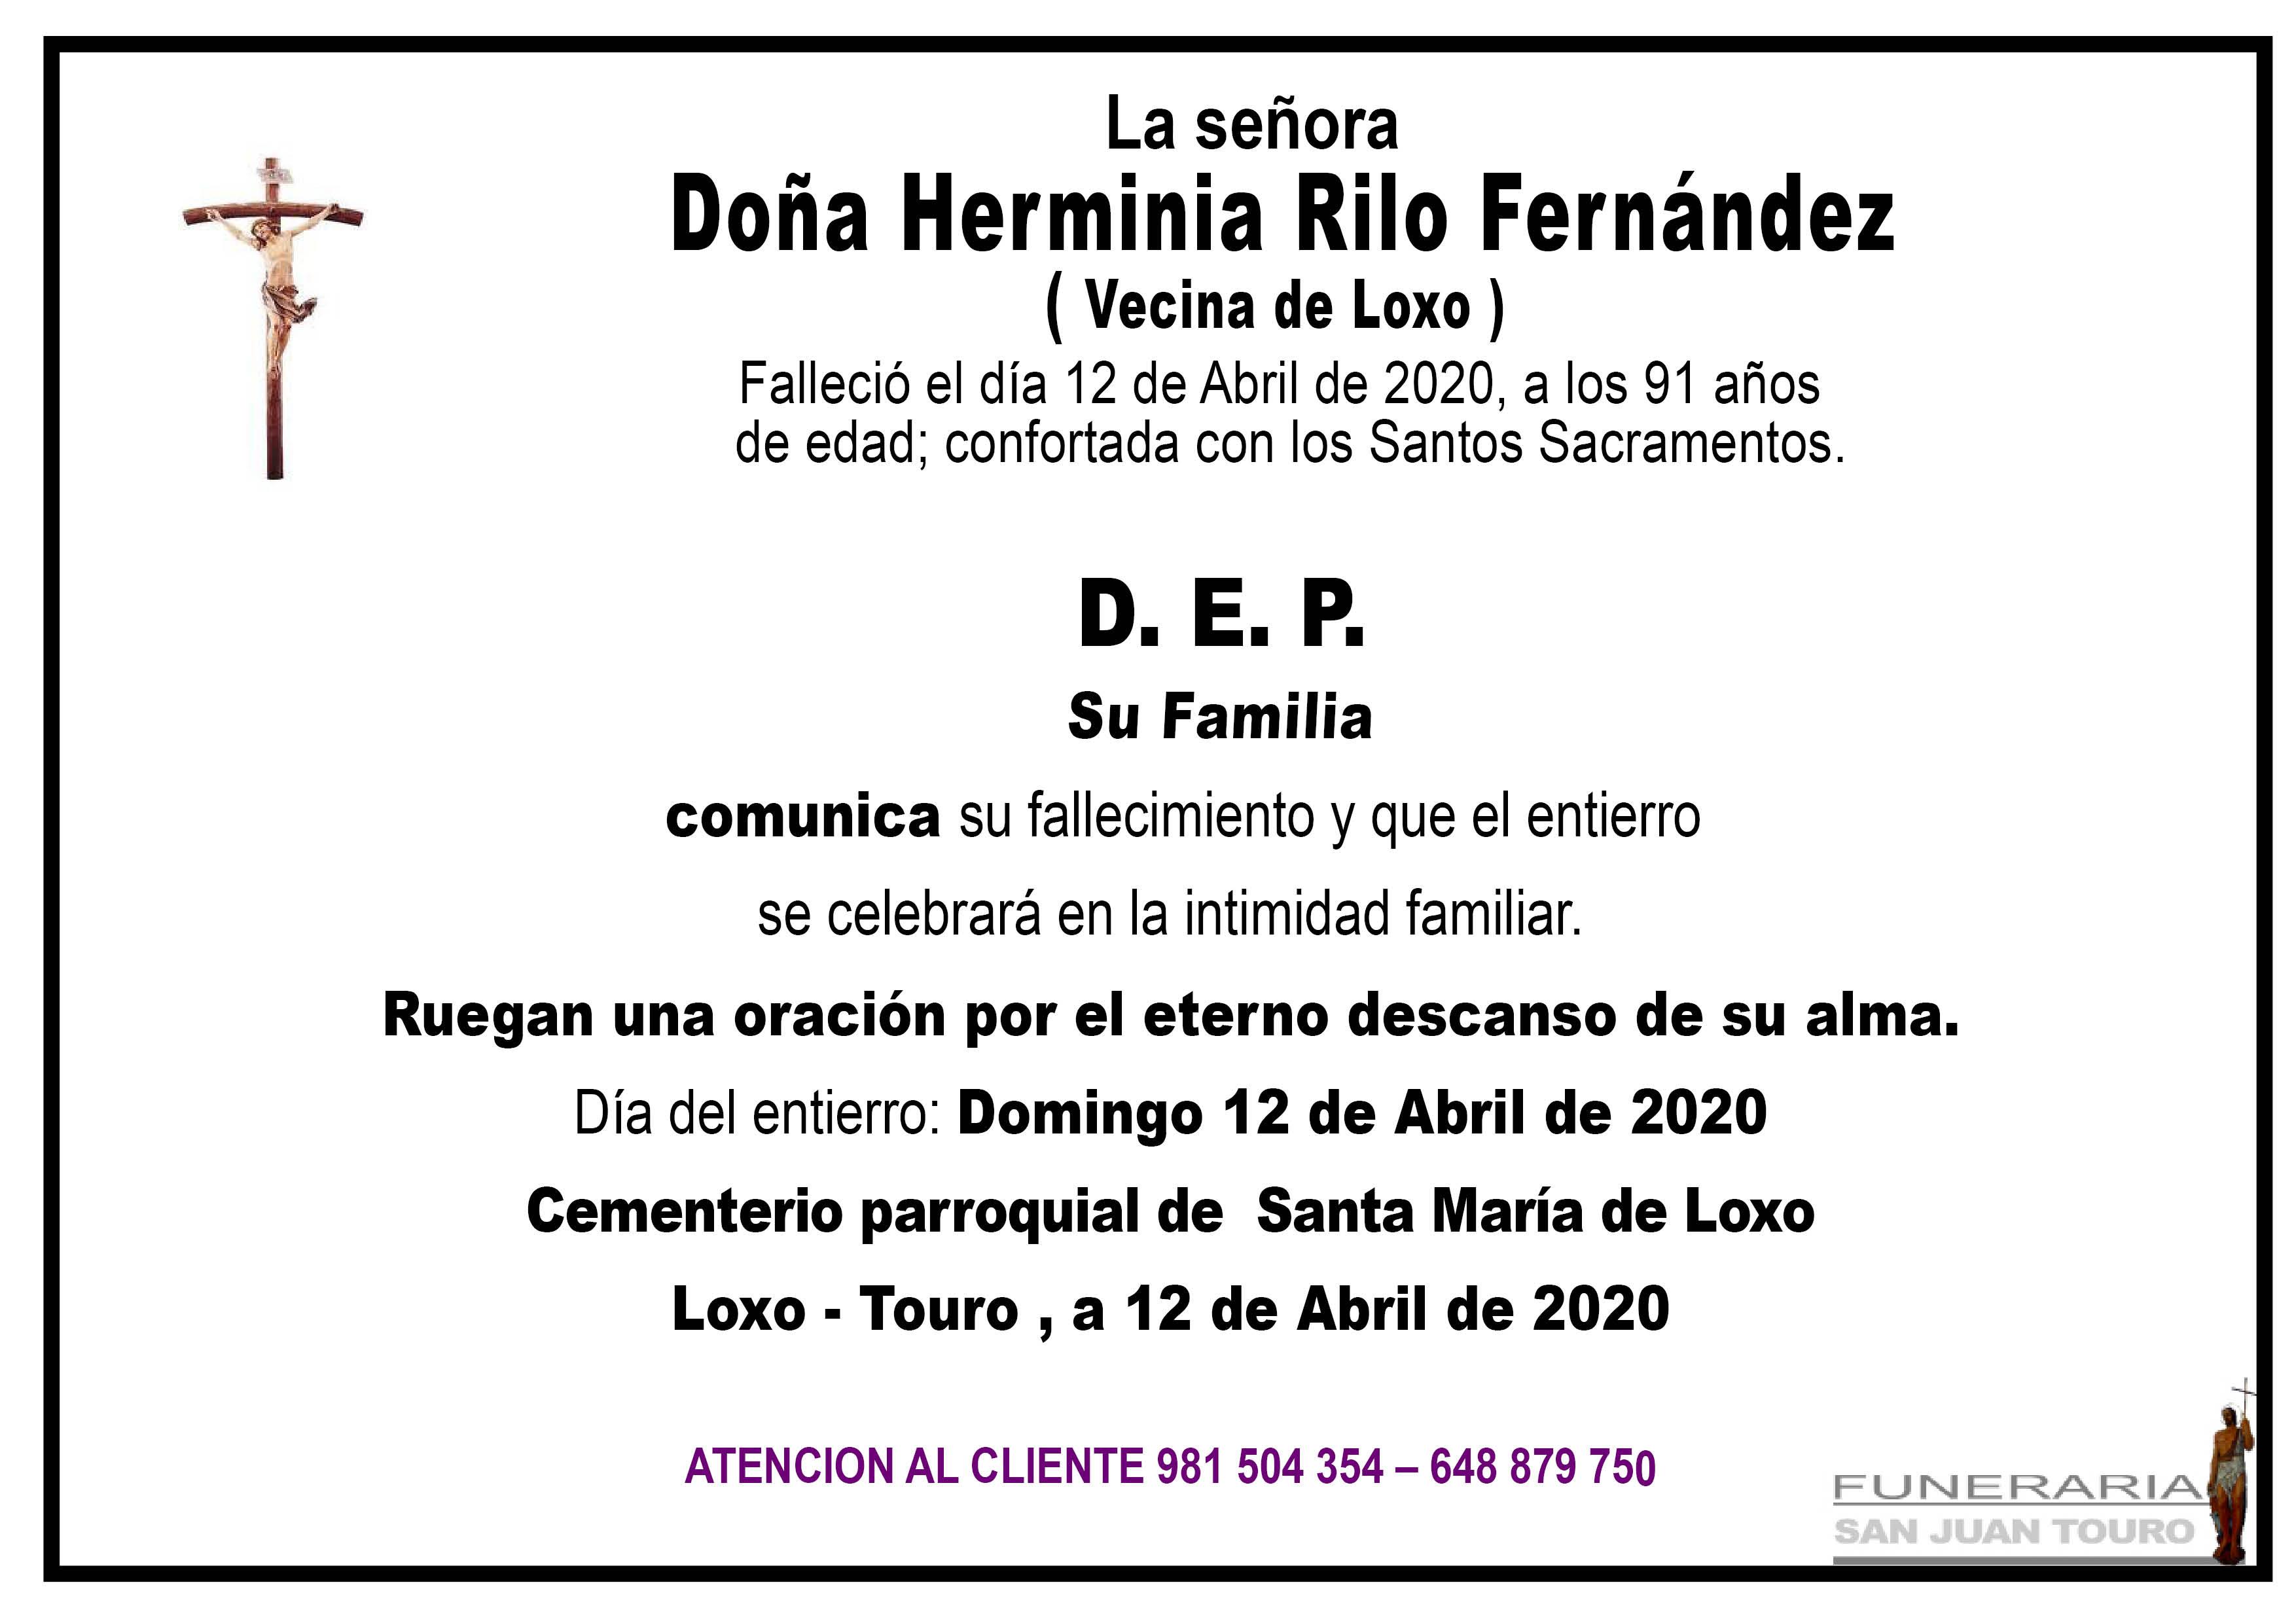 Esquela de SEPELIO DE DOÑA HERMINIA RILO FRENÁNDEZ